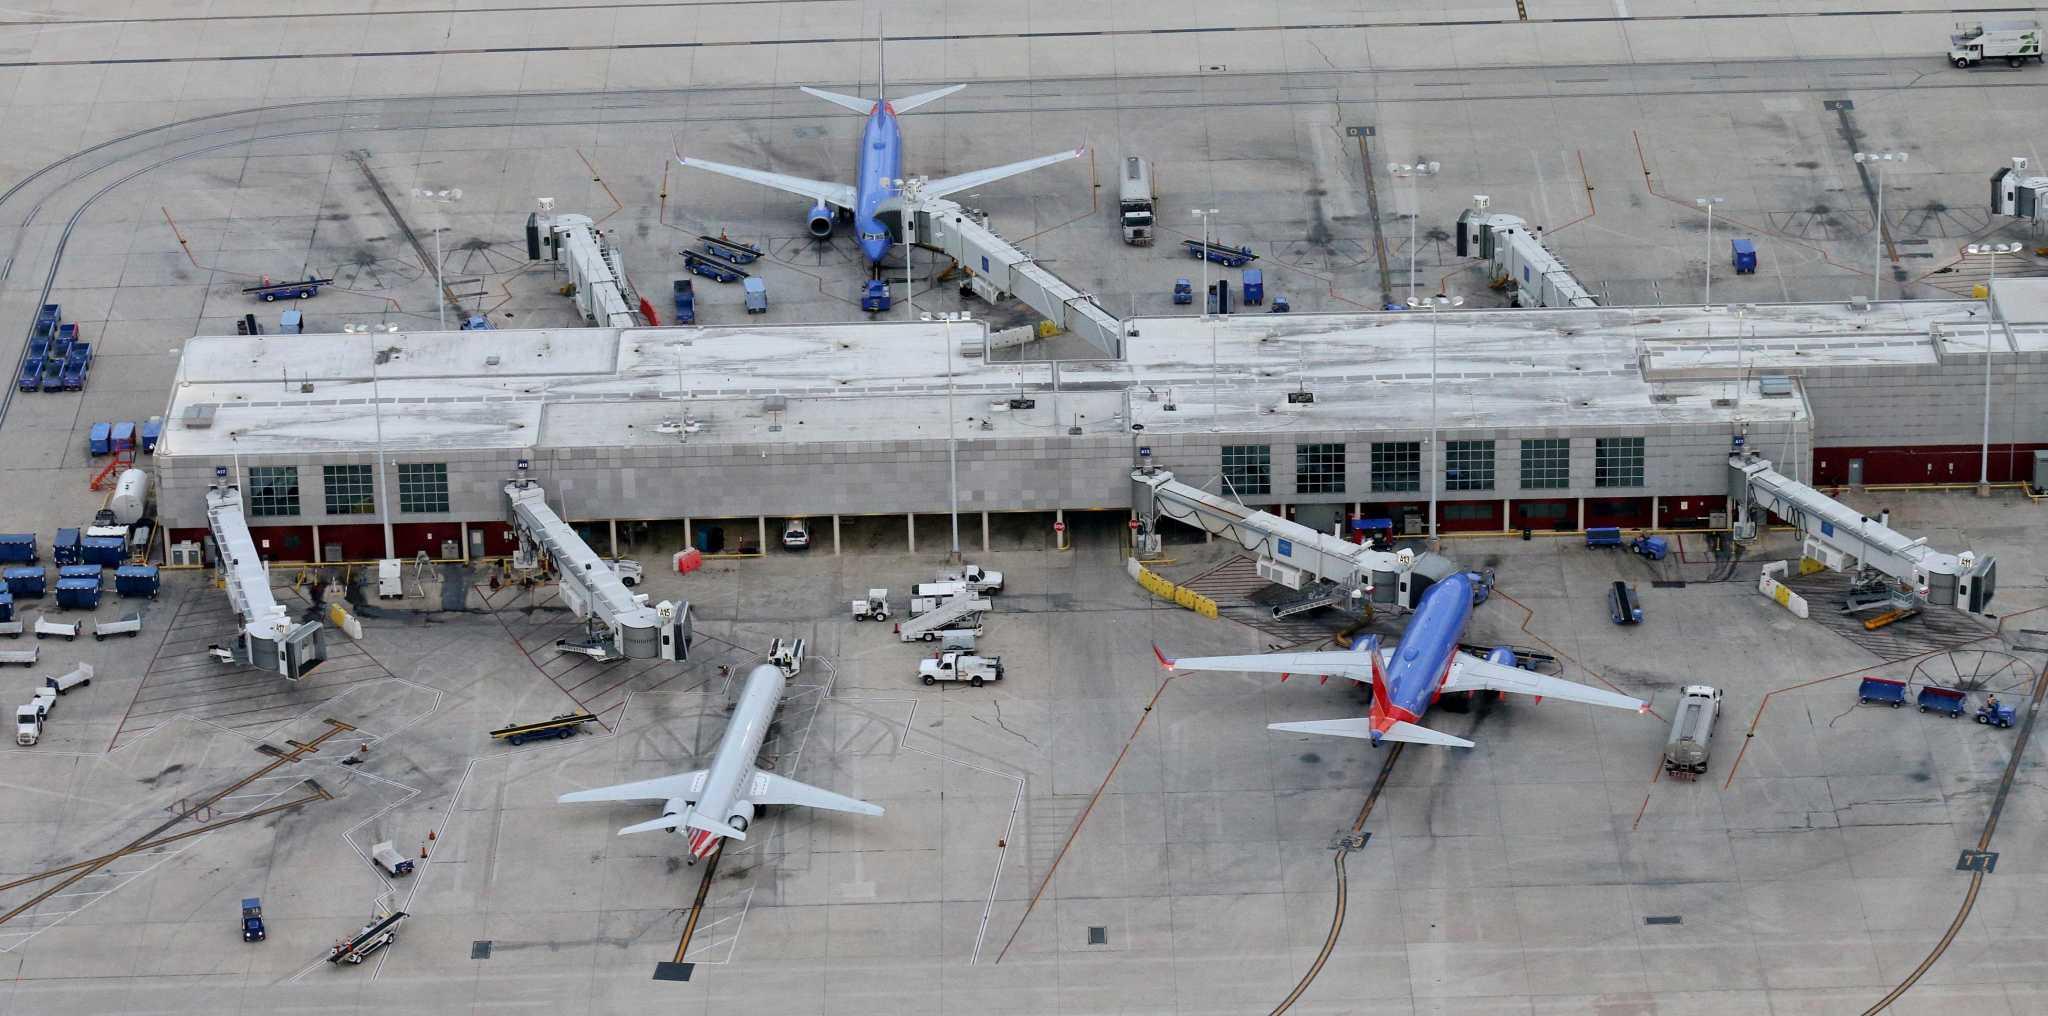 san antonio airport losing